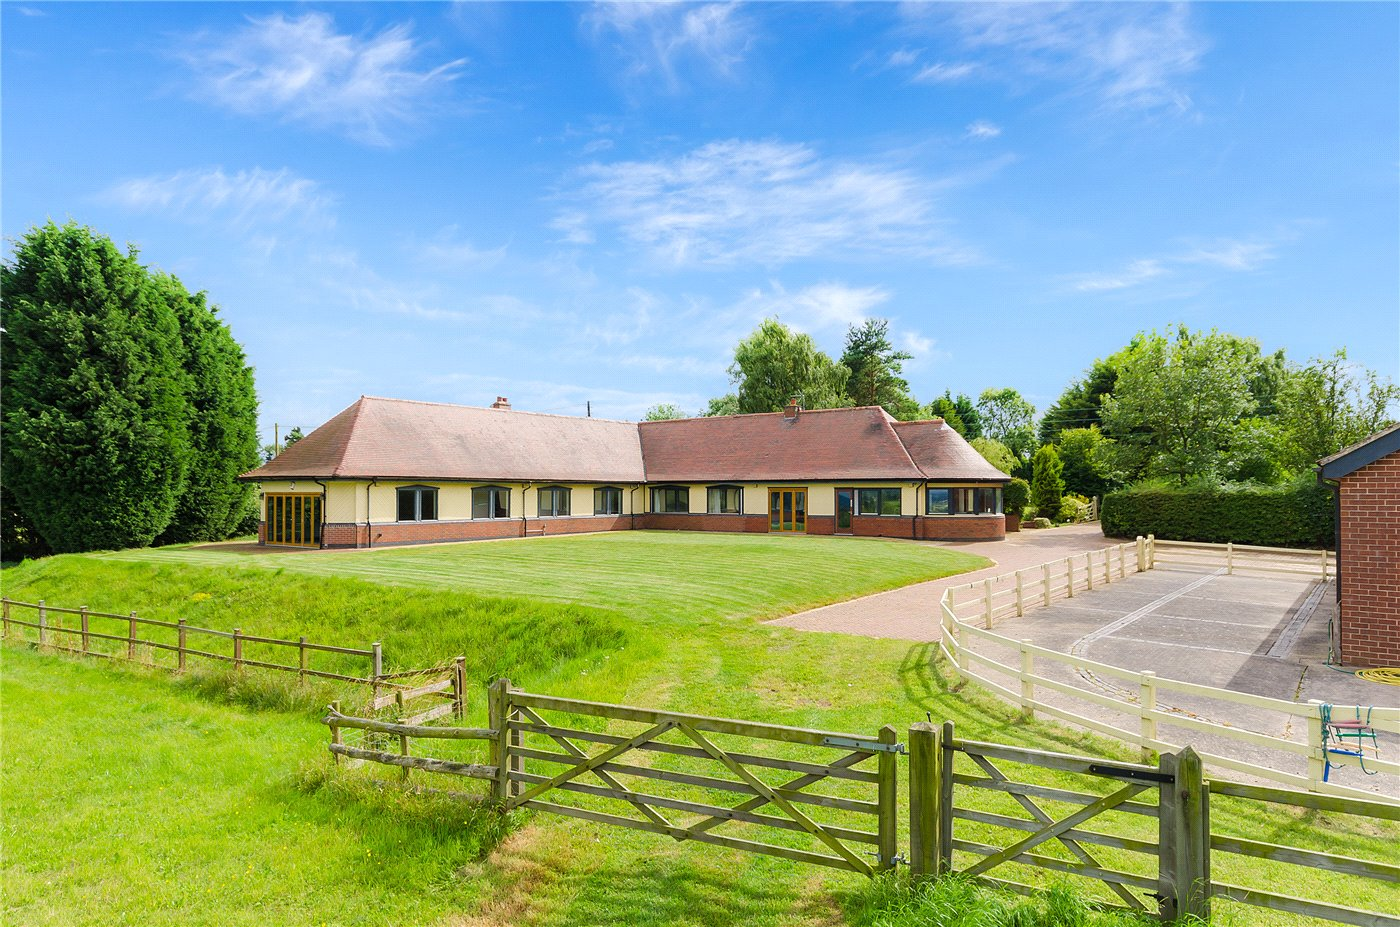 4 Bedroom Property For Sale In Melton Road Hickling